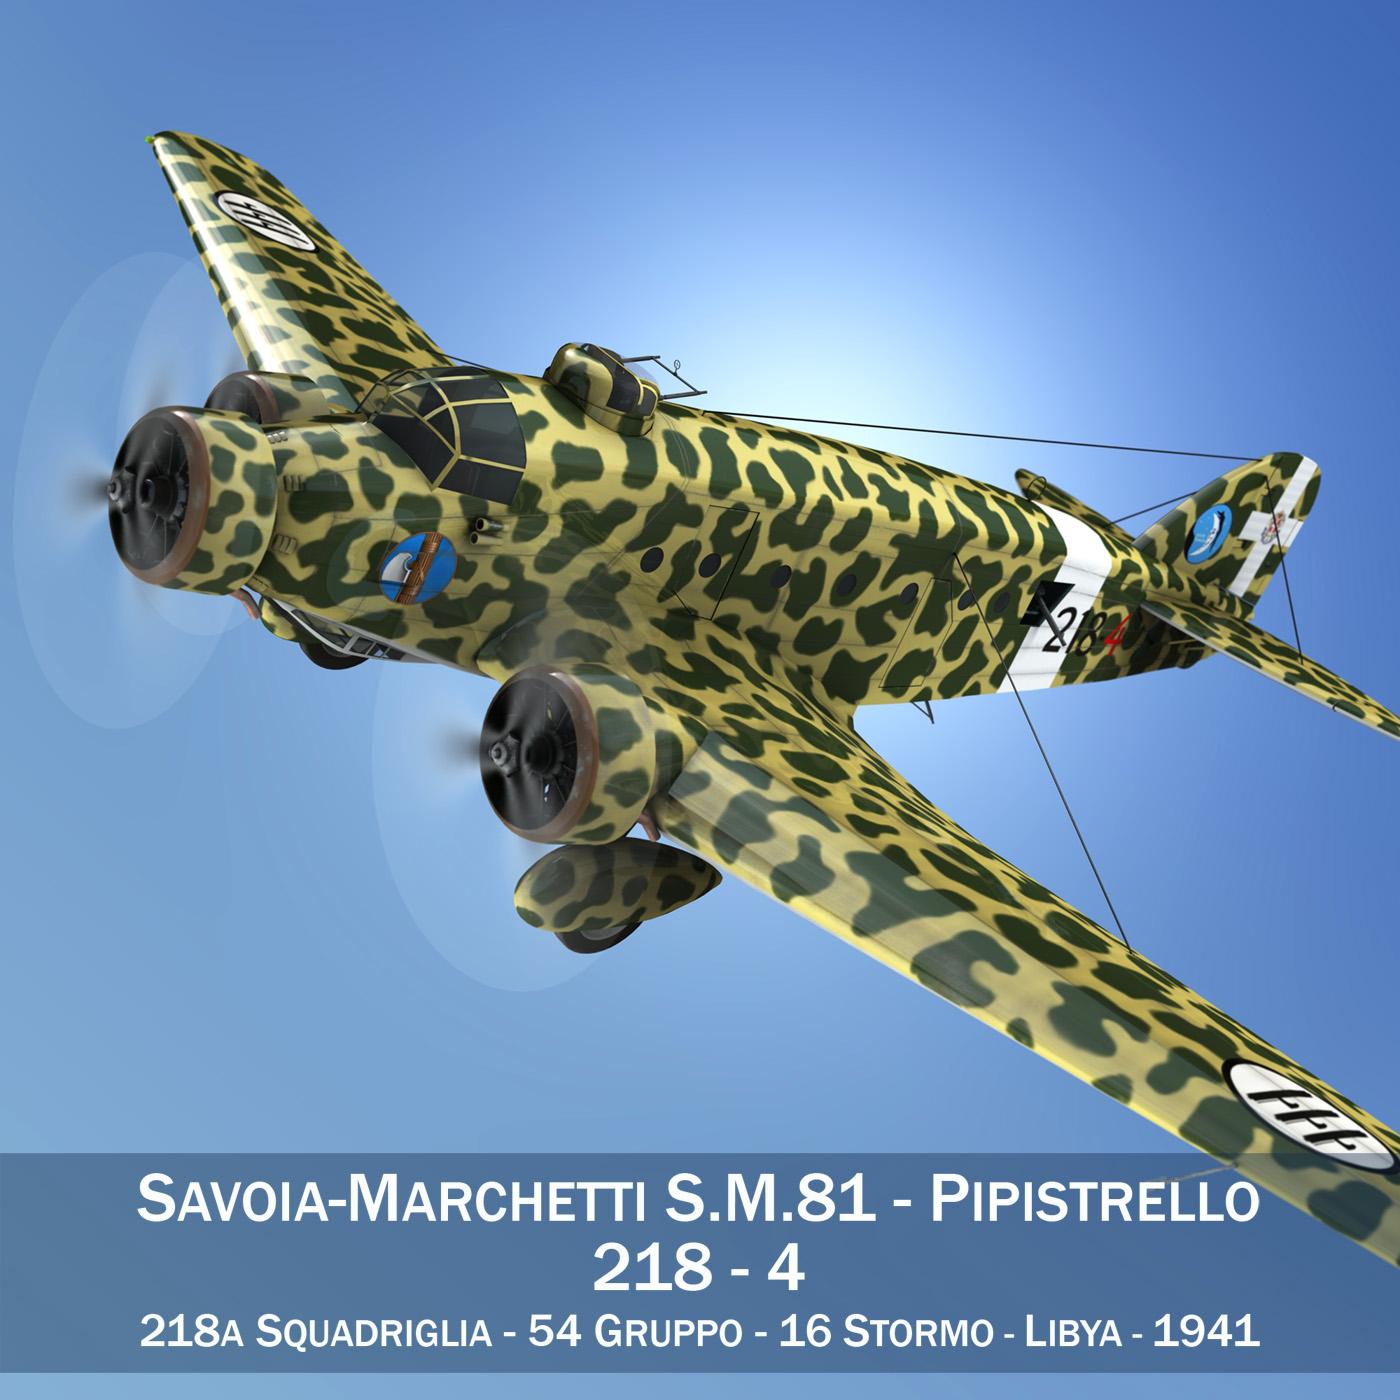 savoia-marchetti s.m.81 pipistrello 3d model 3ds fbx c4d lwo obj 274184